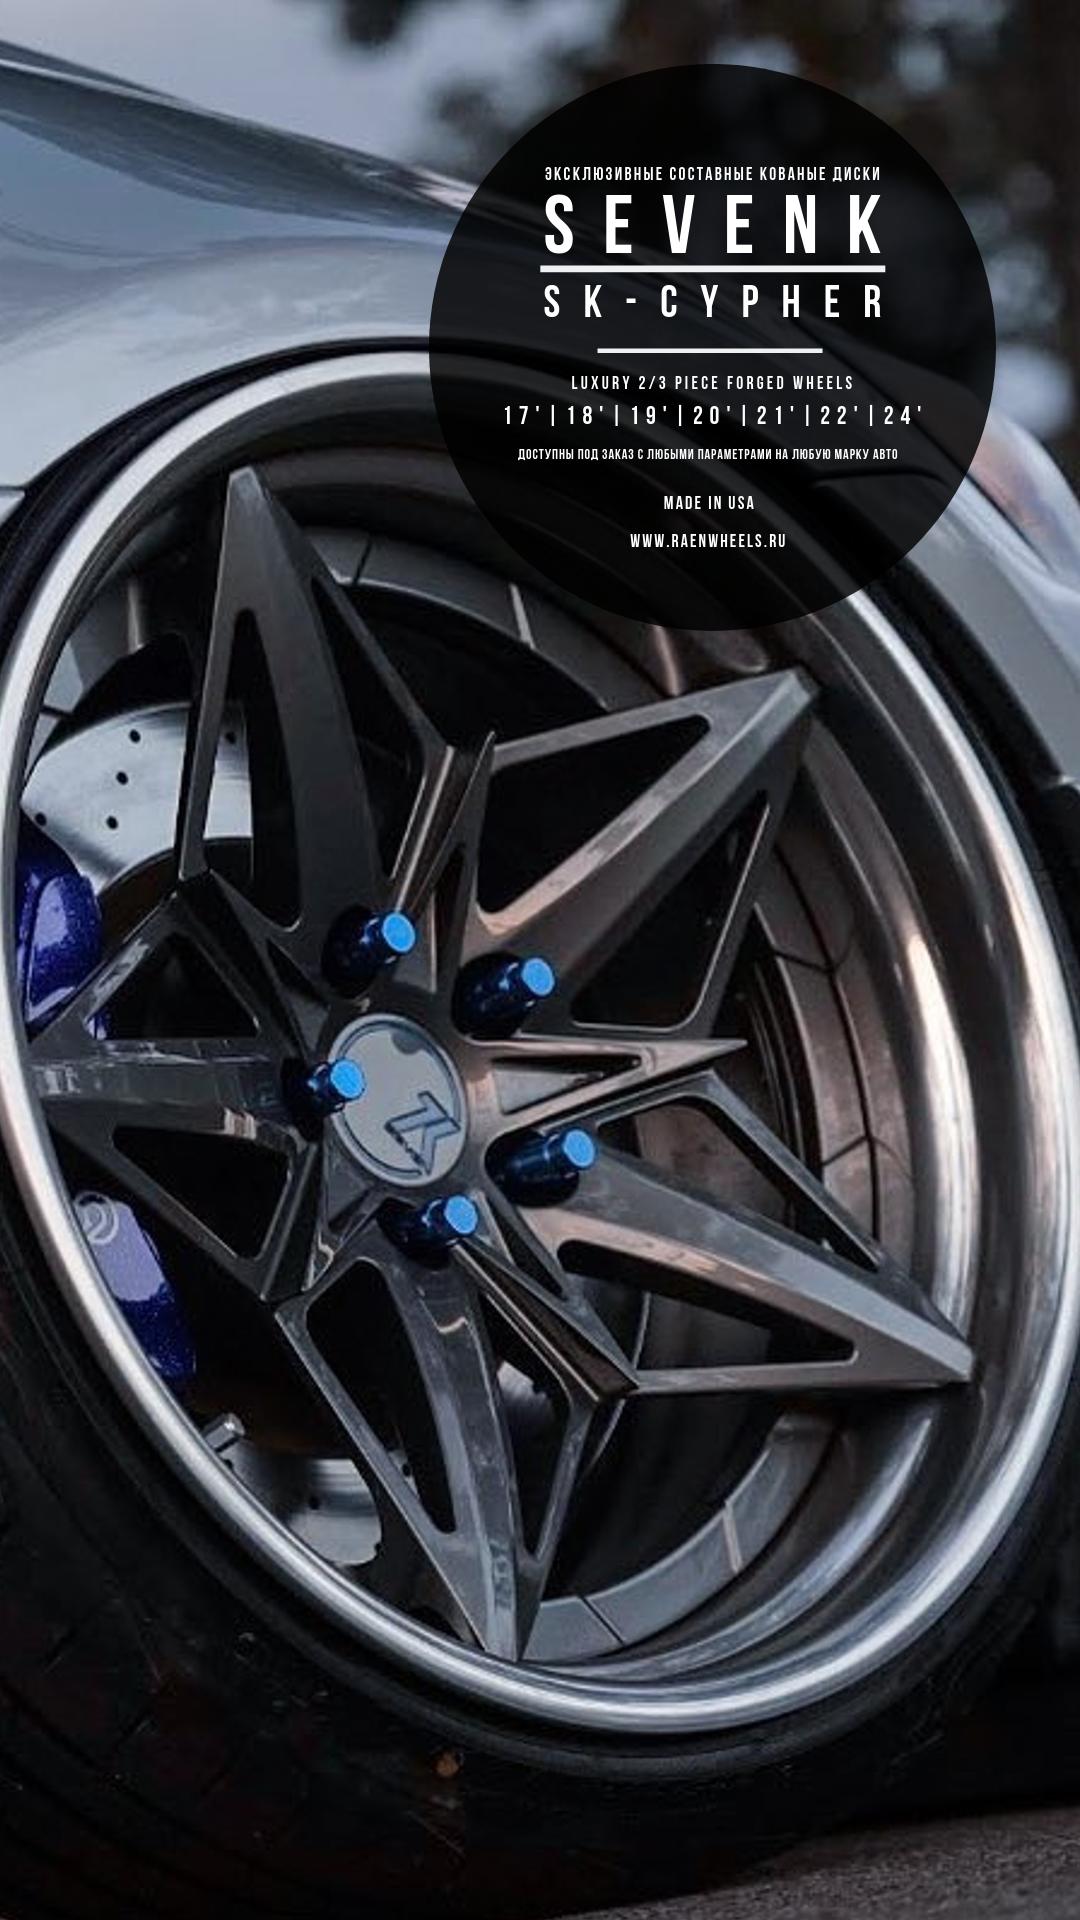 Составные кованые диски SevenK SK-Cypher - Магазин RaenWheels.ru #forgedwheels #wheels #кованыедиски #customwheels #luxurywheels #колеса #диски автотюнинг #fitment #carporn #slammed #lowcarsmeet #static #stanceworks #lowdaily #stancenation #шины #low #колеса #дискишины #Japanwheels #диски #moscowcity #wheelsporn #rims #stancenation #slammedsociety #airlift #стенсуха #стенсхуенс #стенс #автодиски #дискинапродажу #raenwheels #sevenkwheels #fireworx #grounded #tsunamipicnic #тюнингспб